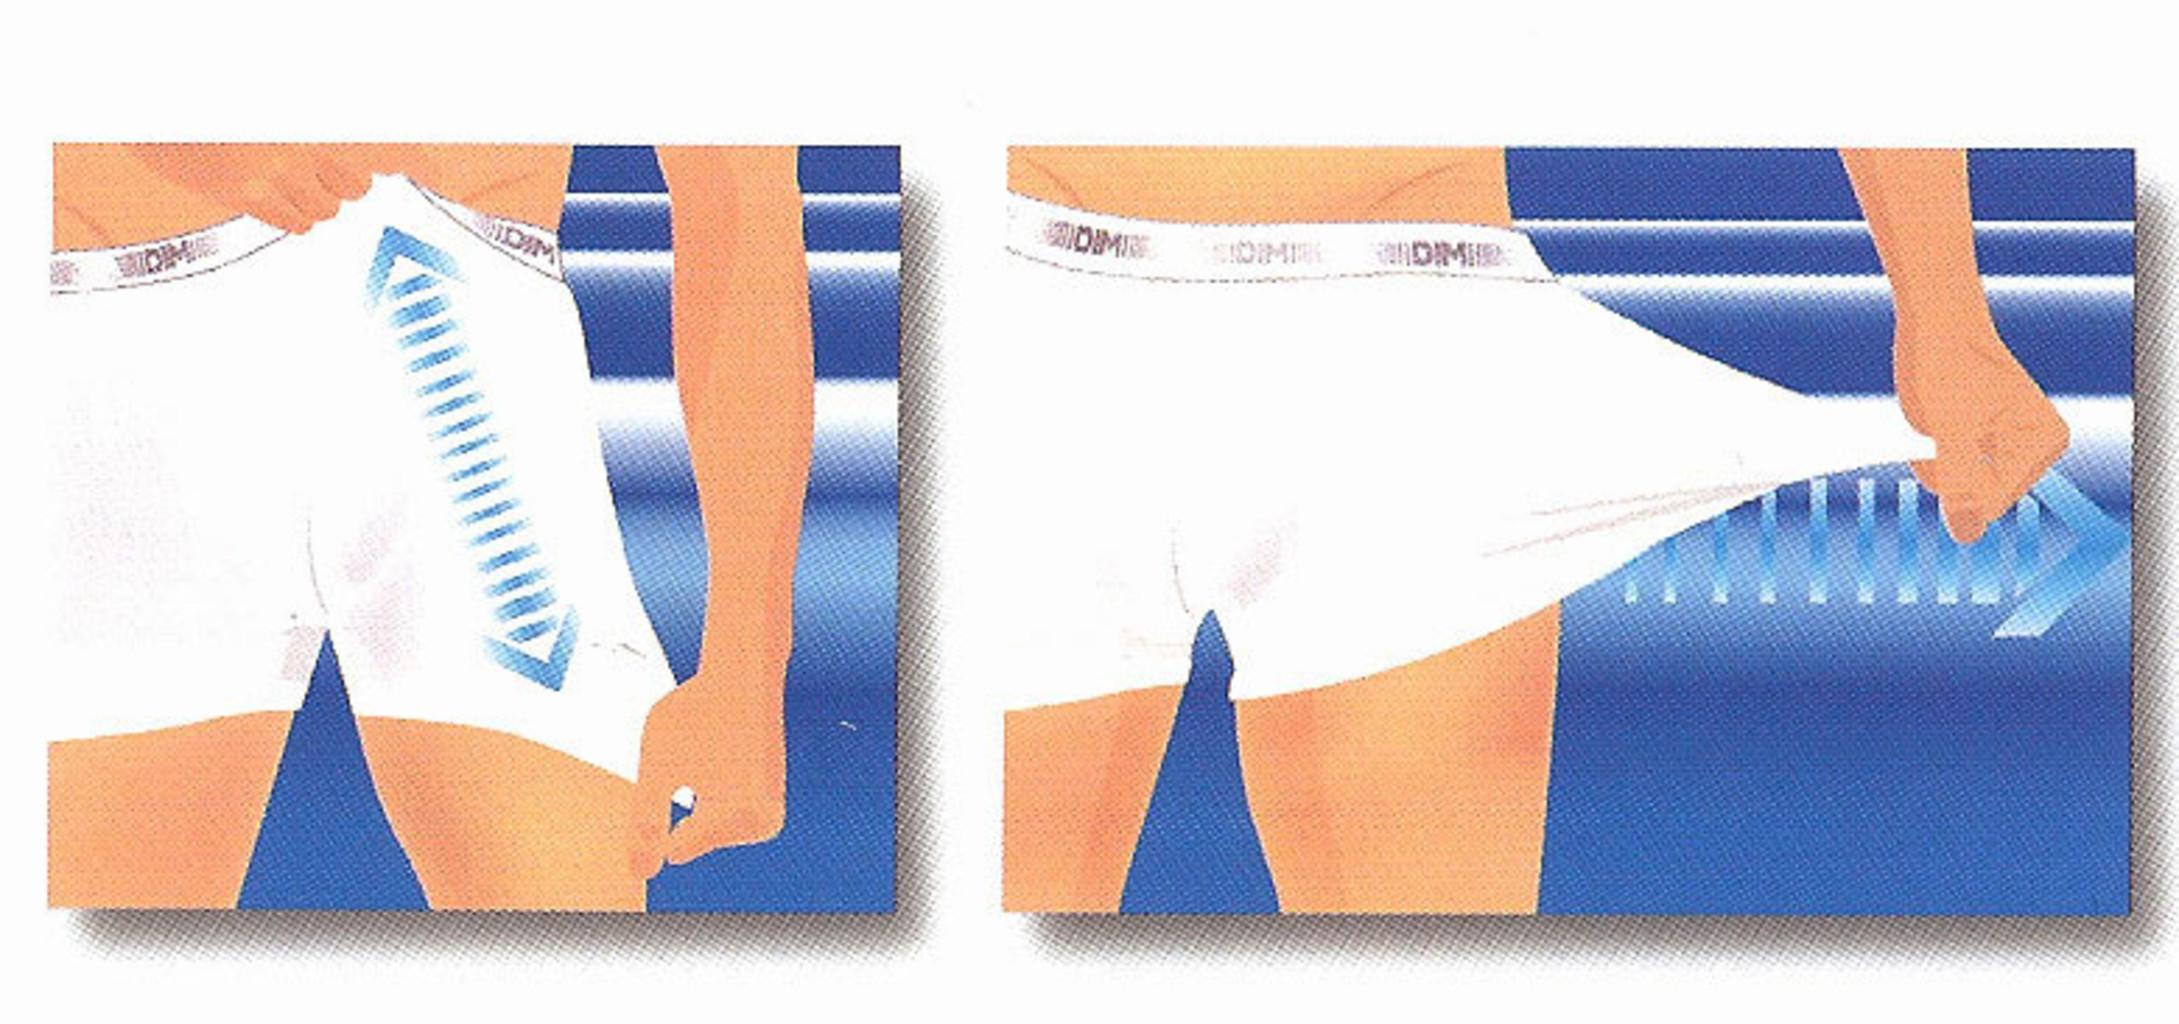 Dim ondergoed Dim 3D Flex Classic Cotton Stretch 2 delig boxershortset  kleur zwart